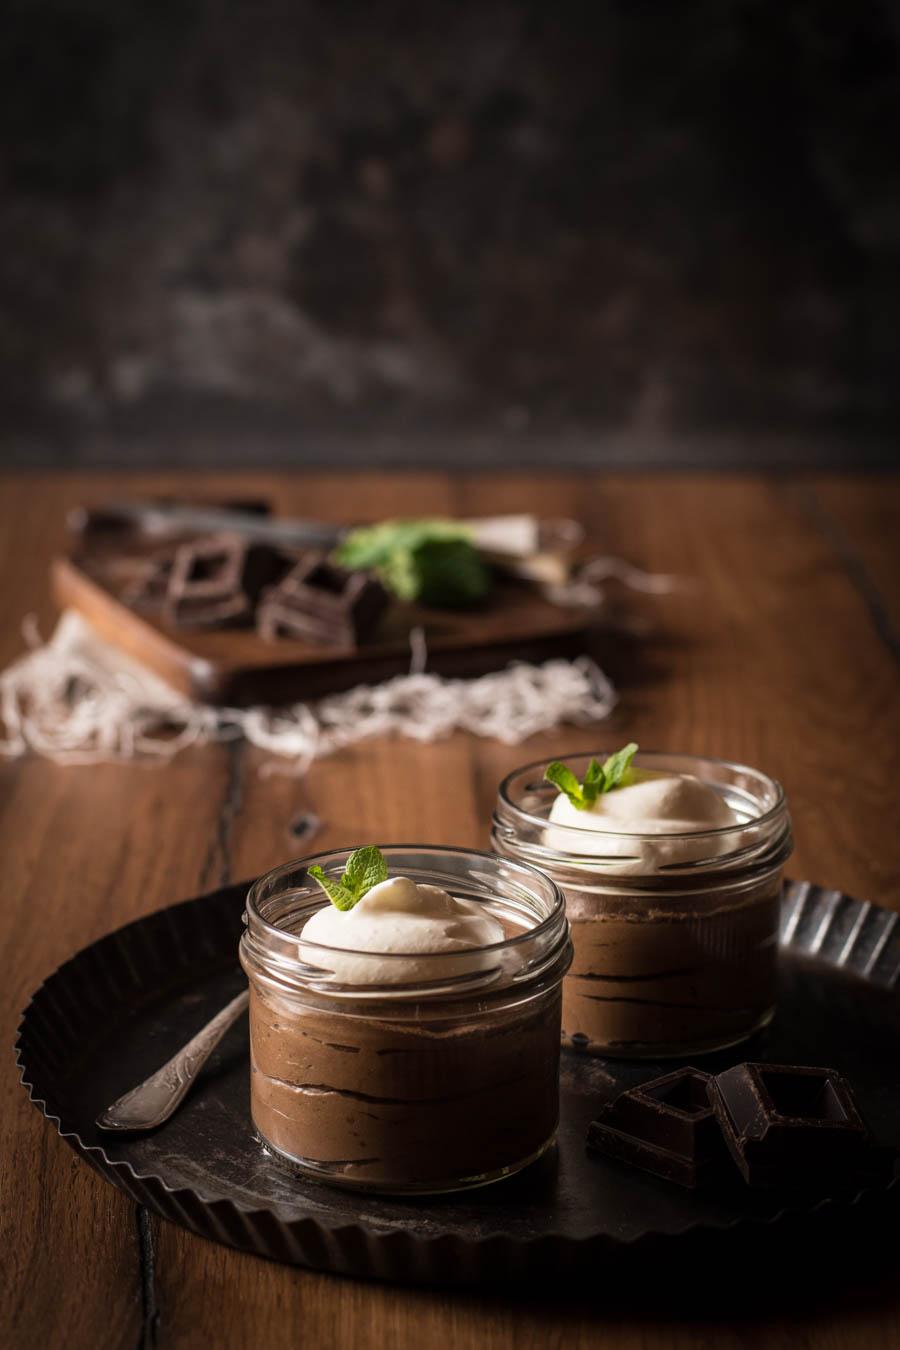 mousse au chocolat schokoladenmousse kleines kulinarium. Black Bedroom Furniture Sets. Home Design Ideas